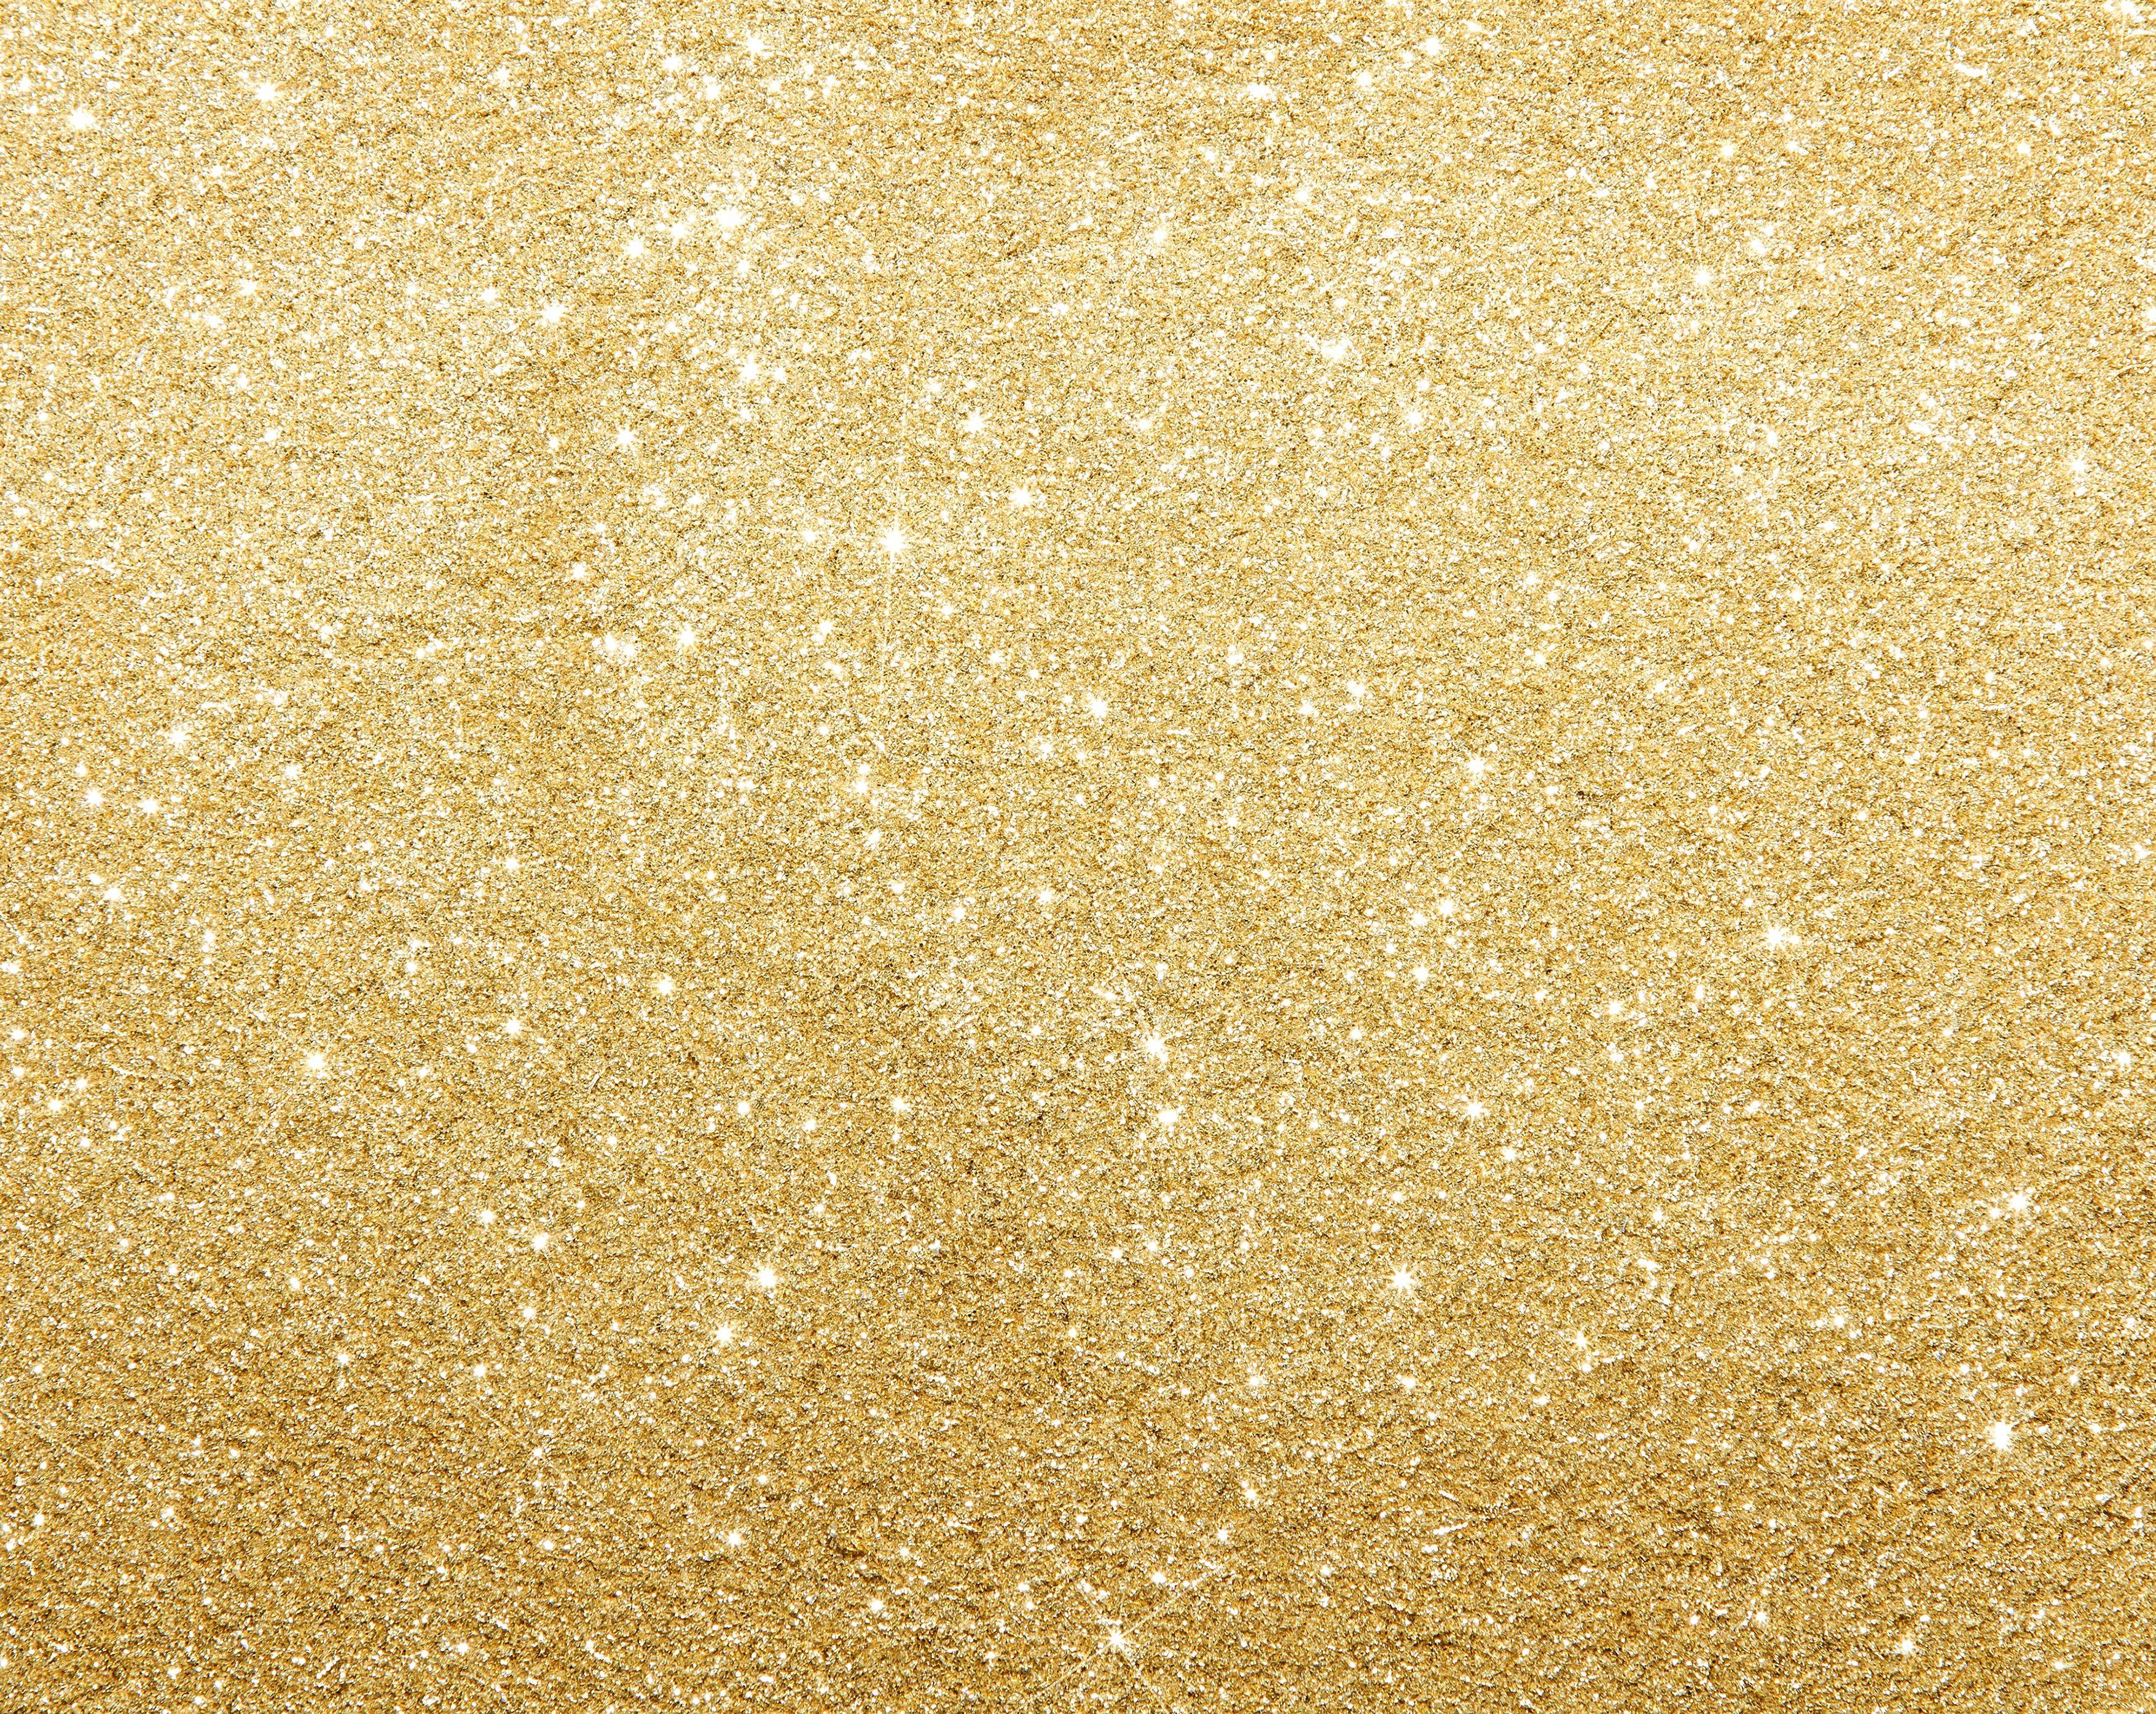 Gold Background Wallpaper - WallpaperSafari